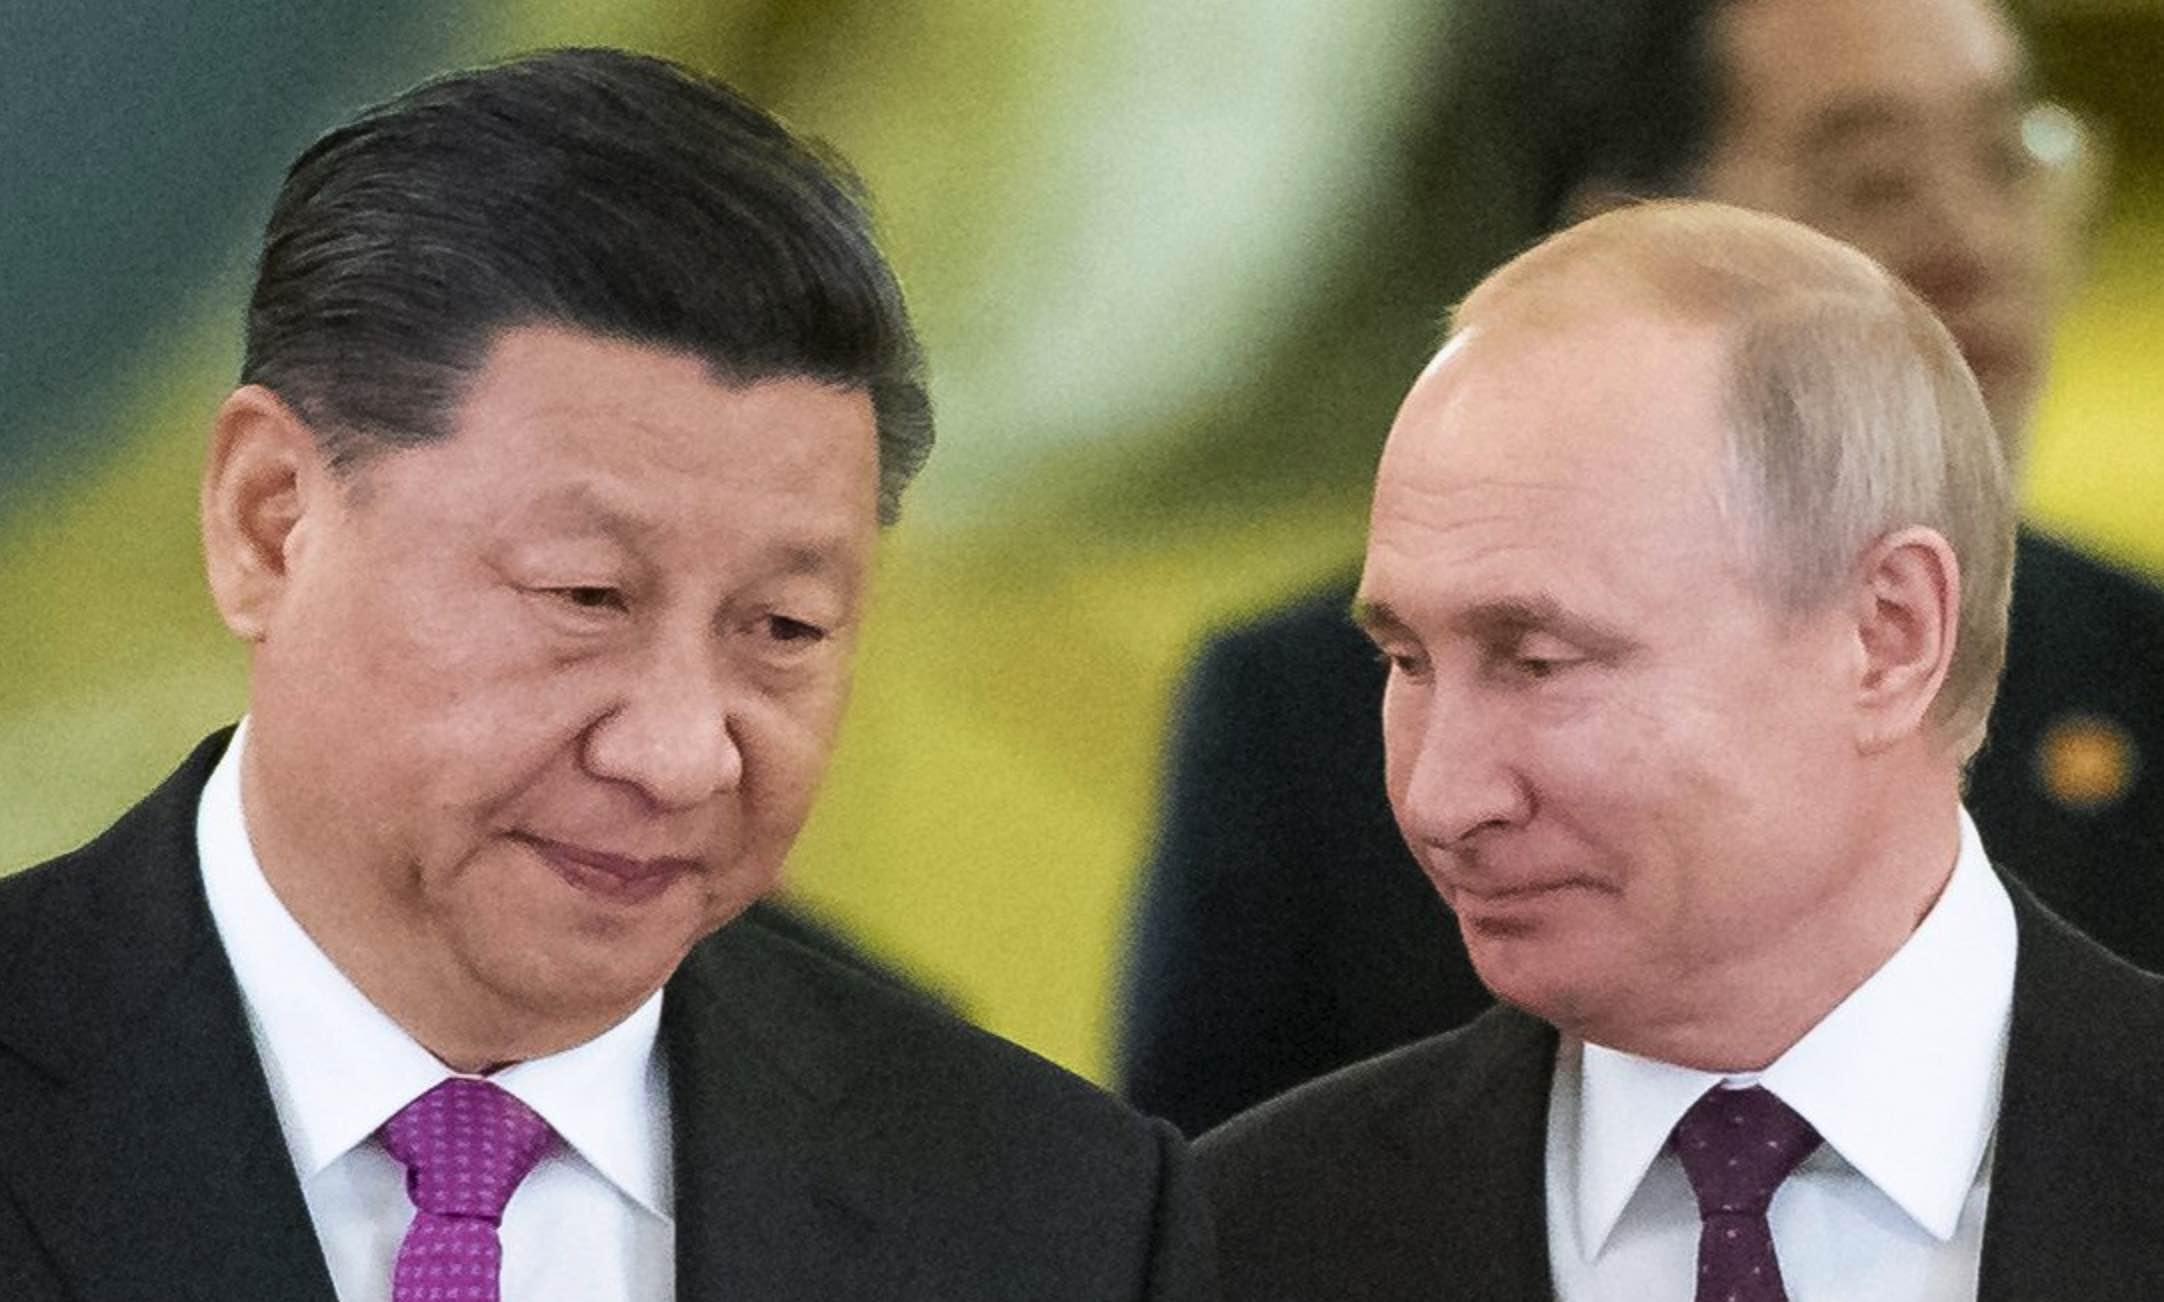 Xi Jinping, Vladimir Putin, Rusia y China versus Estados Unidos